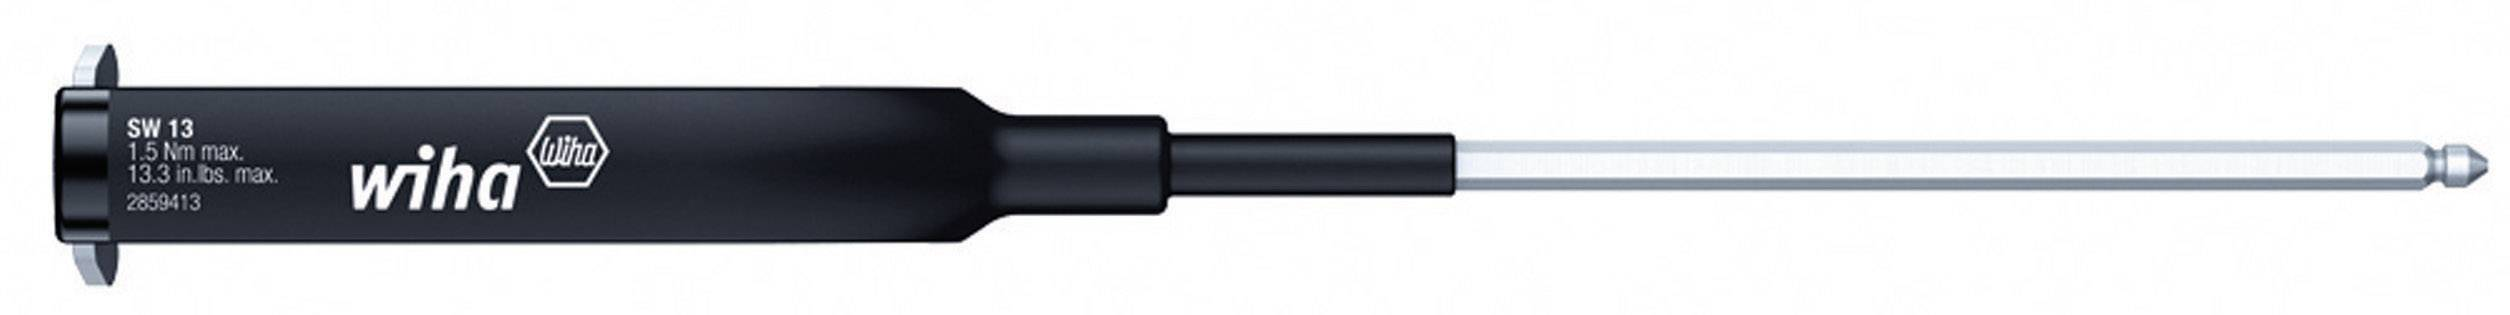 Bit momentového kľúča Wiha Torque 2859 36419, 218 mm